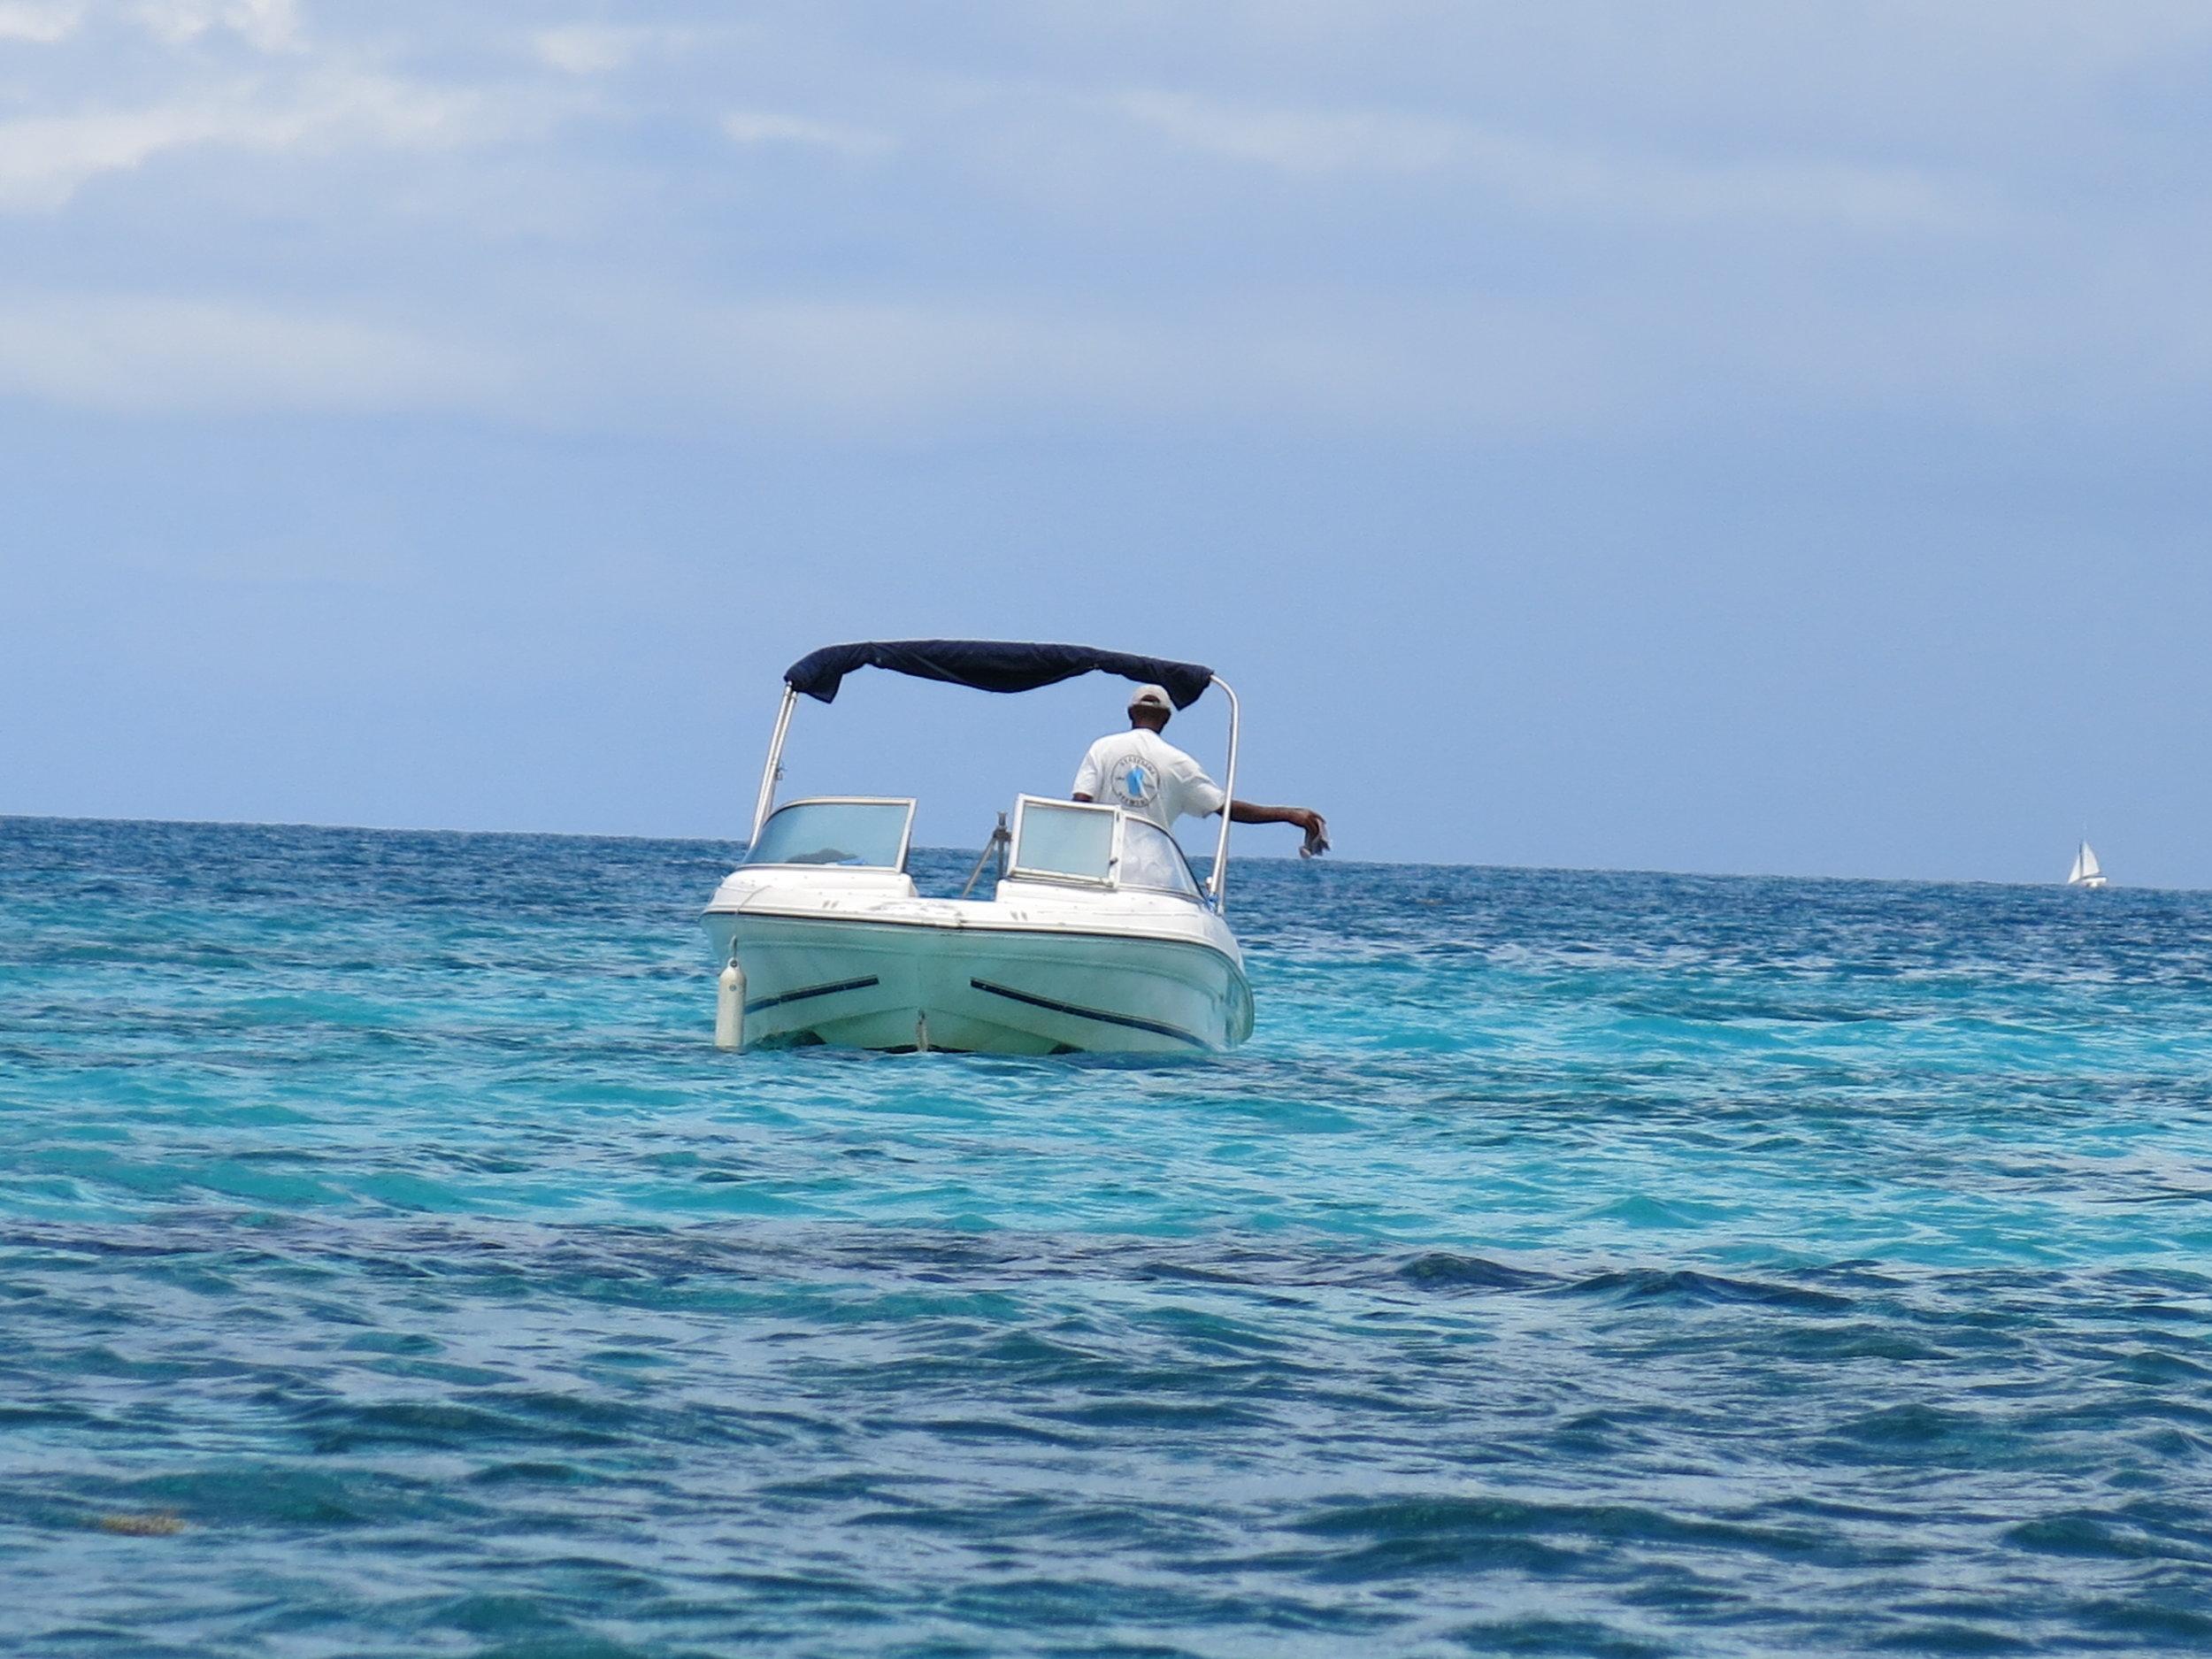 antigua boat.JPG